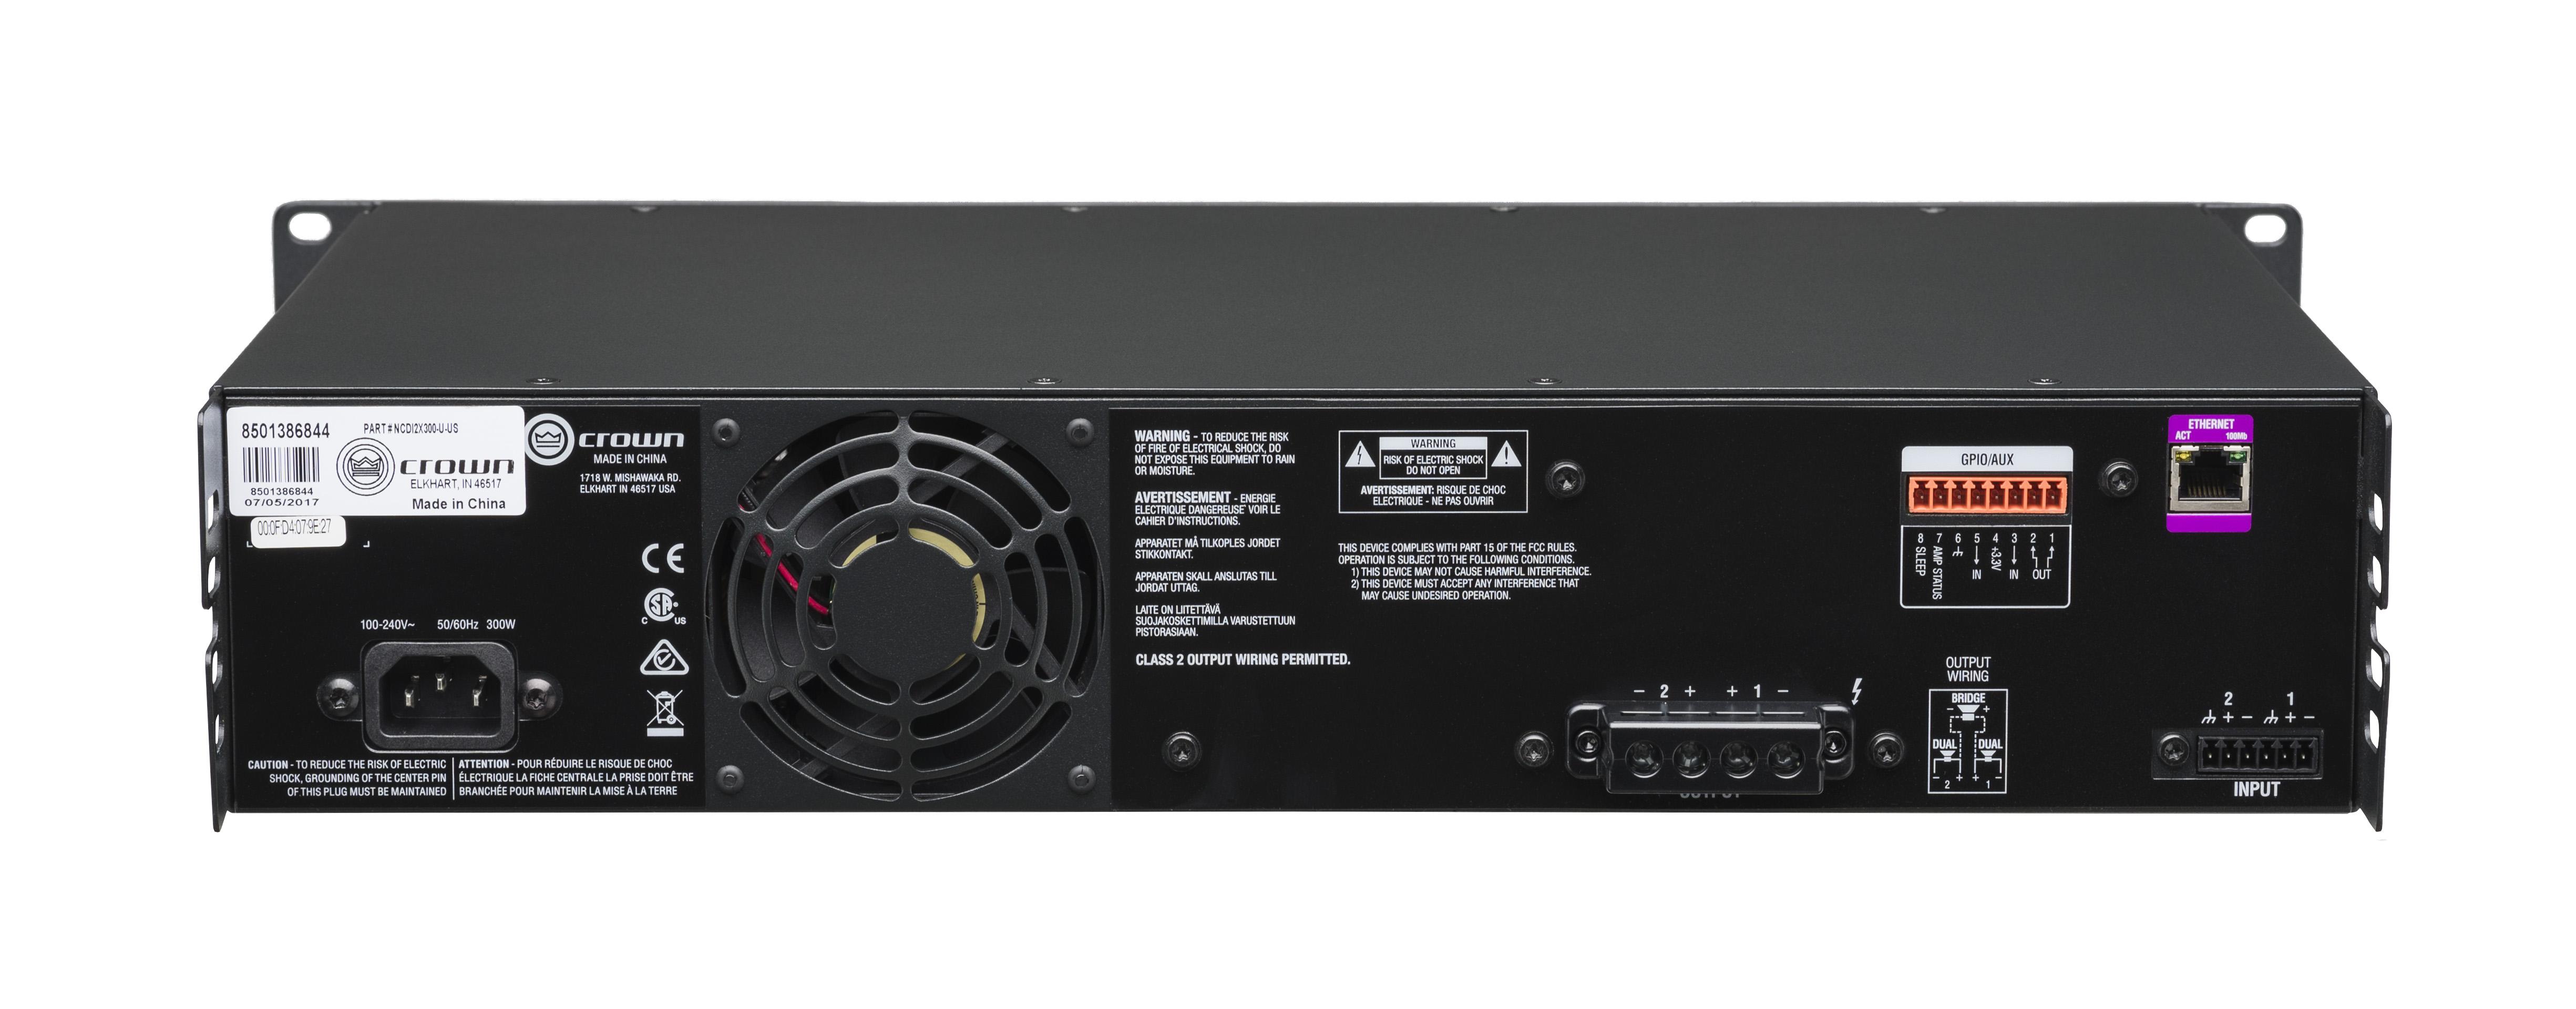 Pyle 20w 2 Ch Power Amplifier Black Pta2 Stereo Amazoncom Home Ptau45 Mini 2x120 Watt Max Crown Cdi Drivecore 2300 Rear High Tiny Square